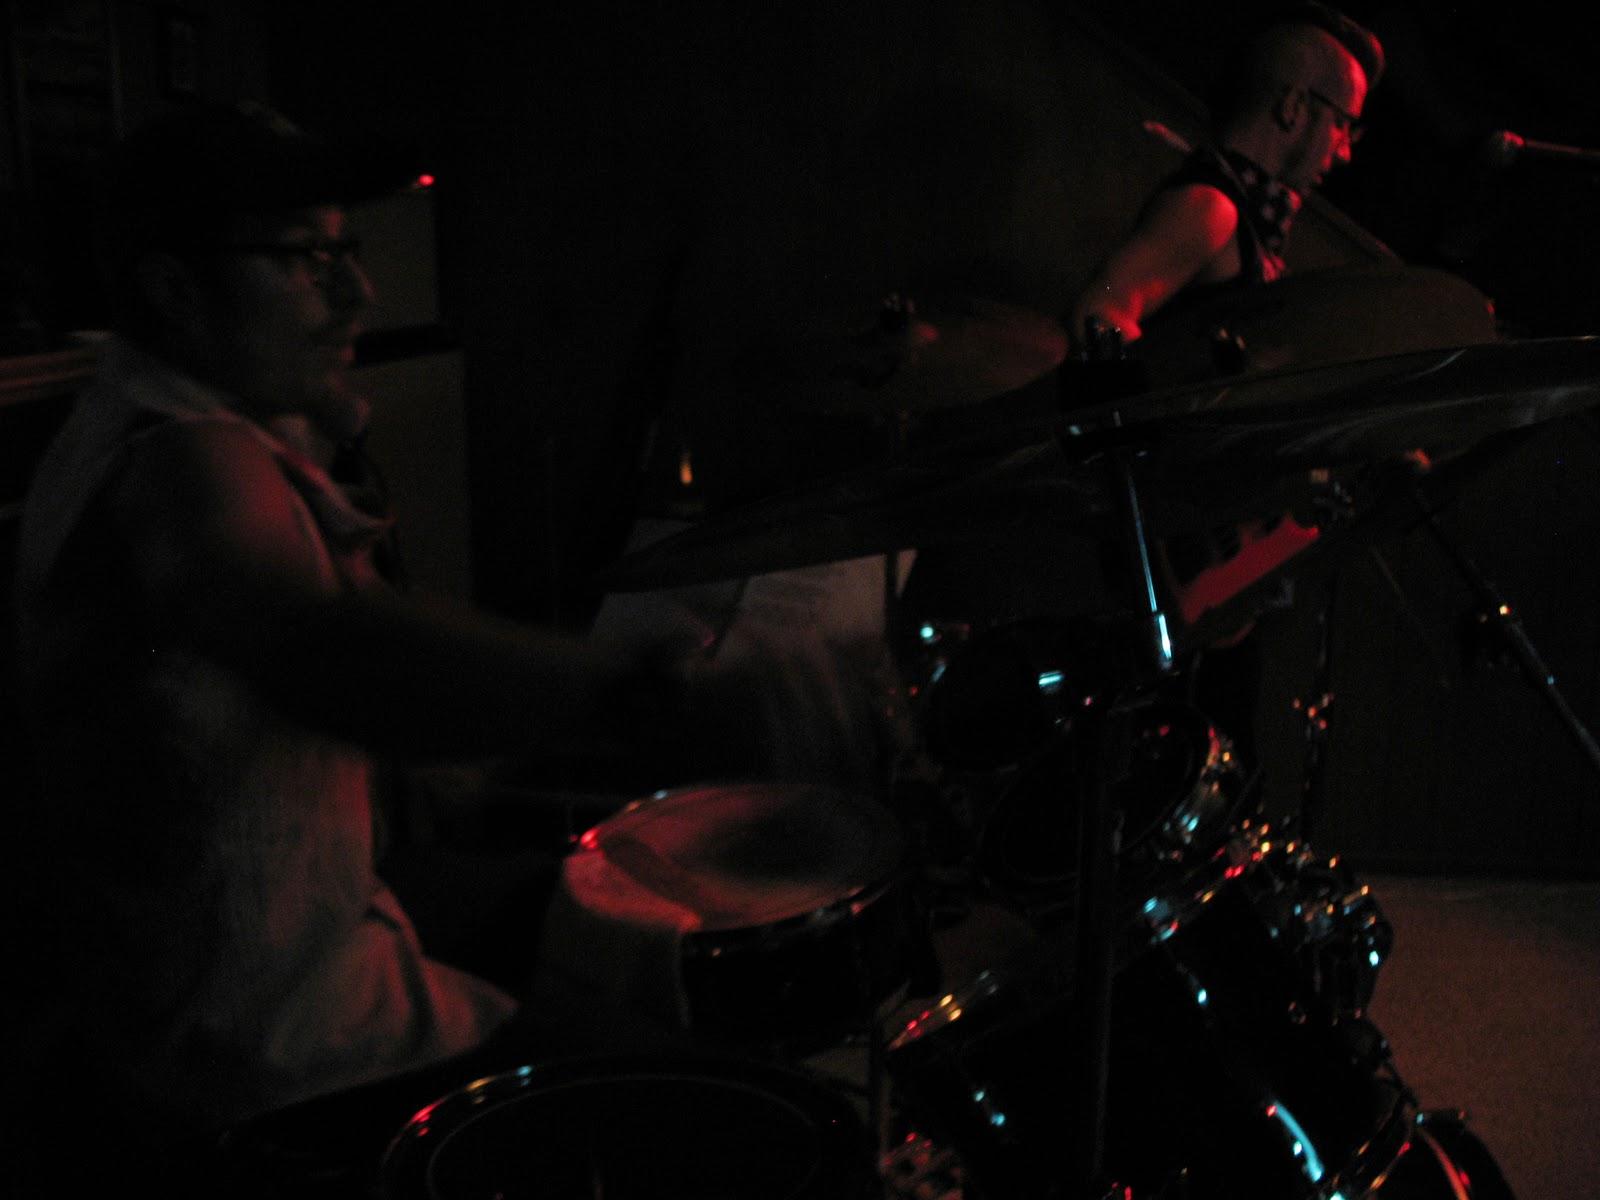 Ringing Cymbal Concert Band